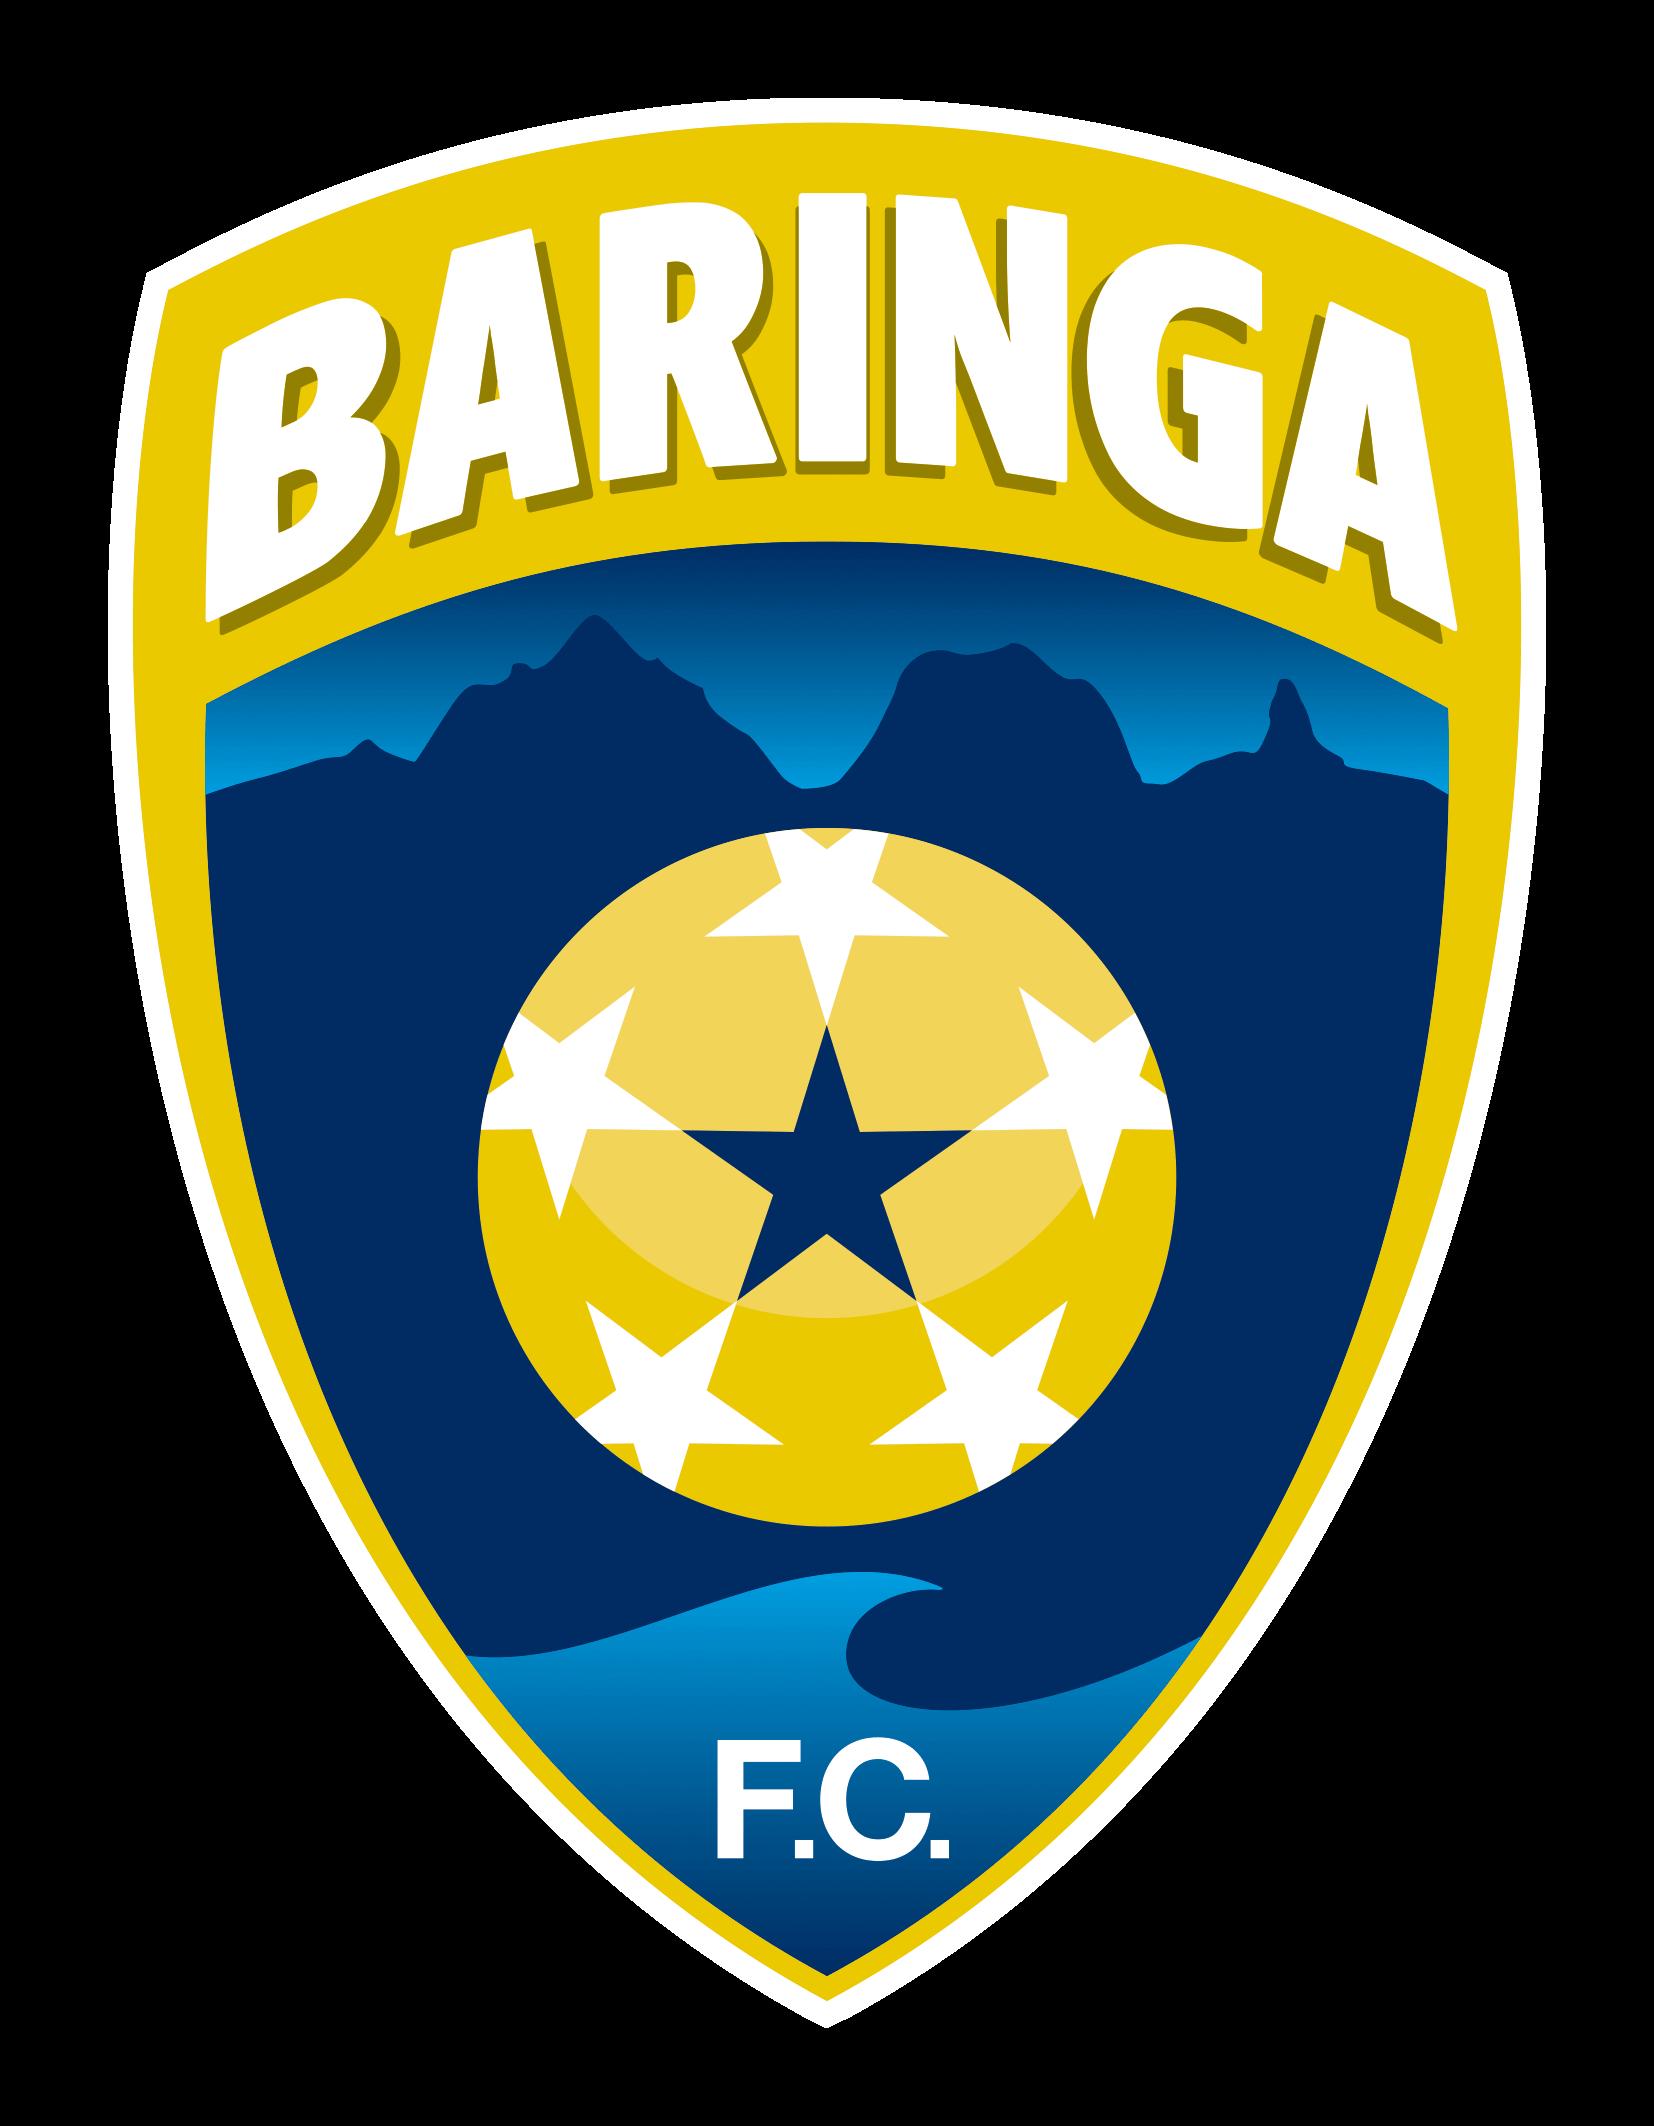 Baringa FC logo